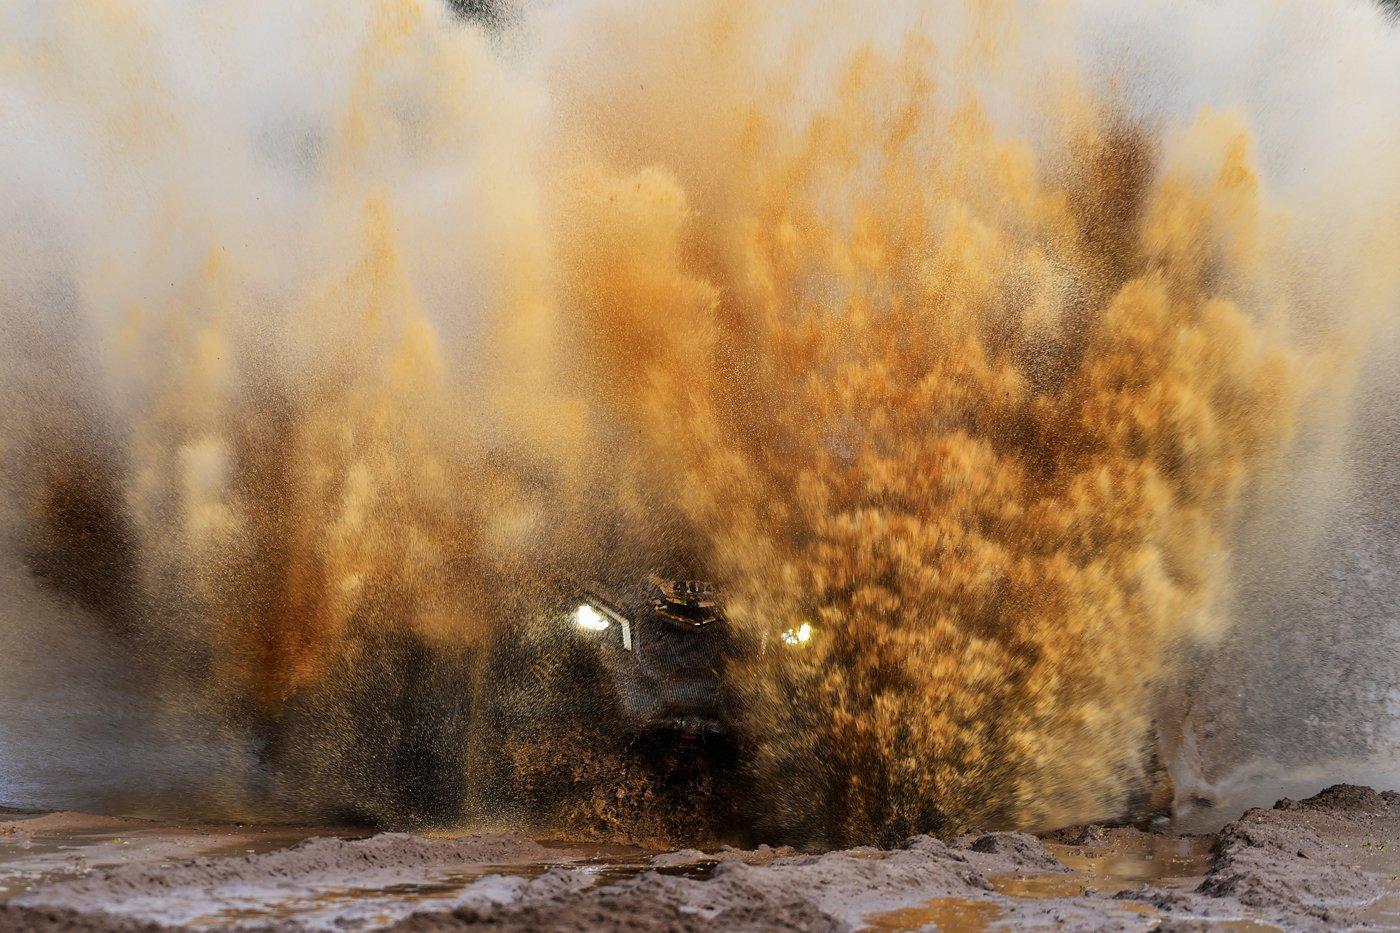 motorsport adrenaline crosscountry baja dakar bajapoland  sport, Paweł  Bożek